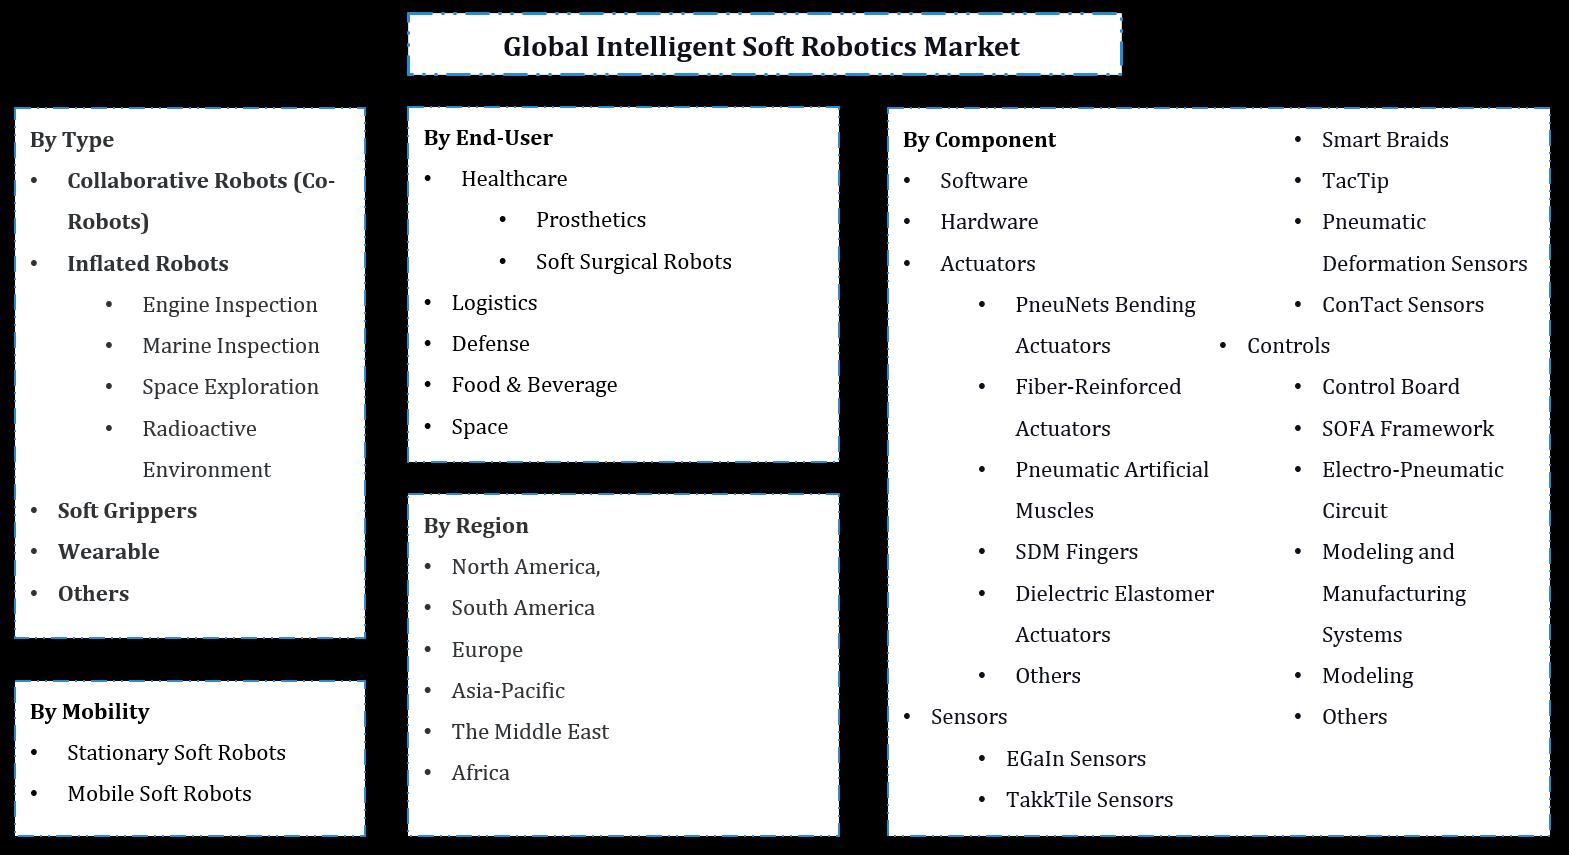 Global Intelligent Soft Robotics Market Segmentation